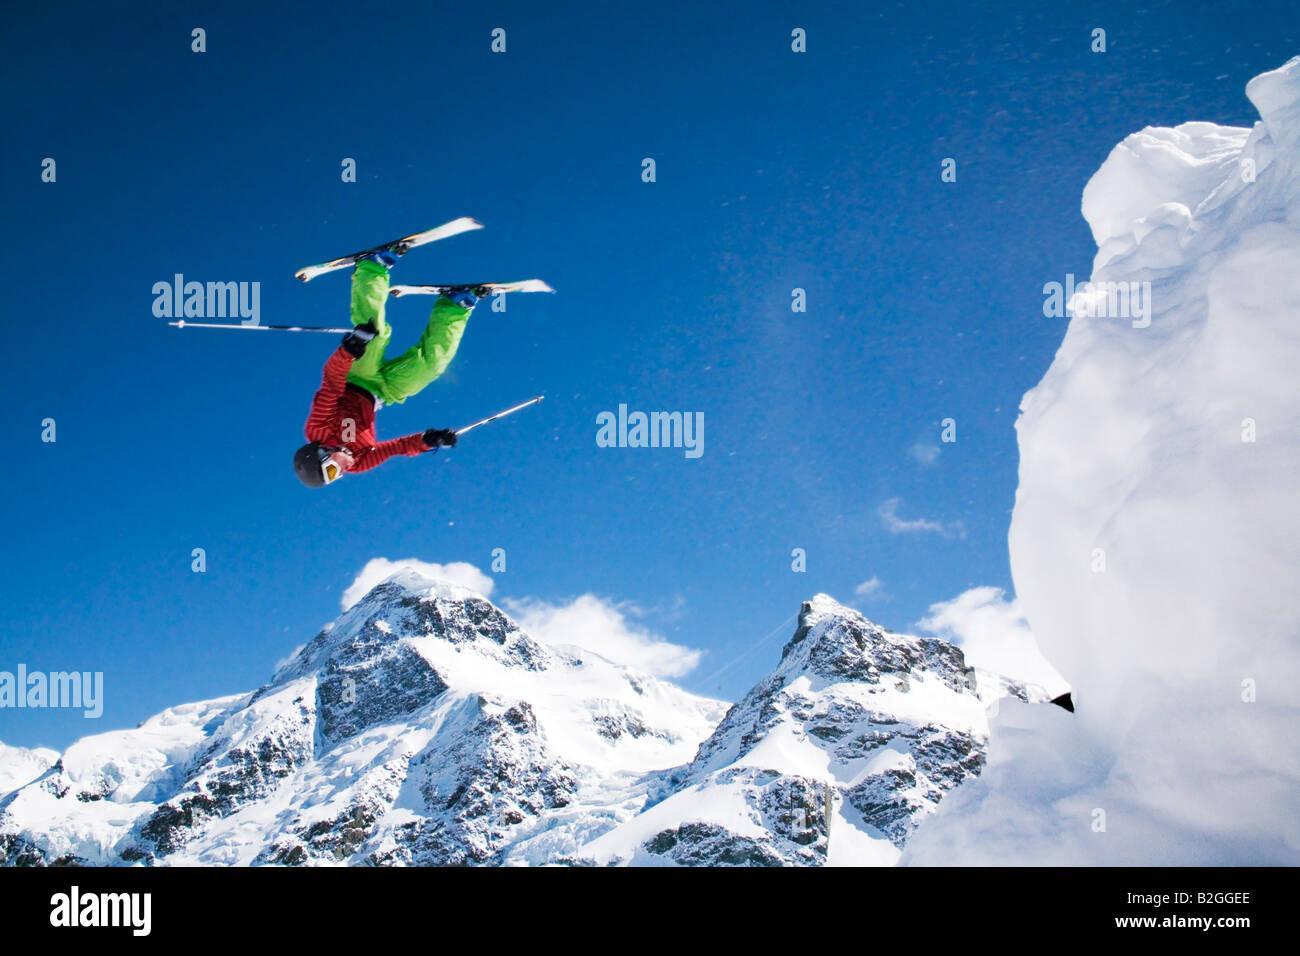 jumping freestyle skiing skier skisport skier ski area mountains snow jump flight sensational - Stock Image